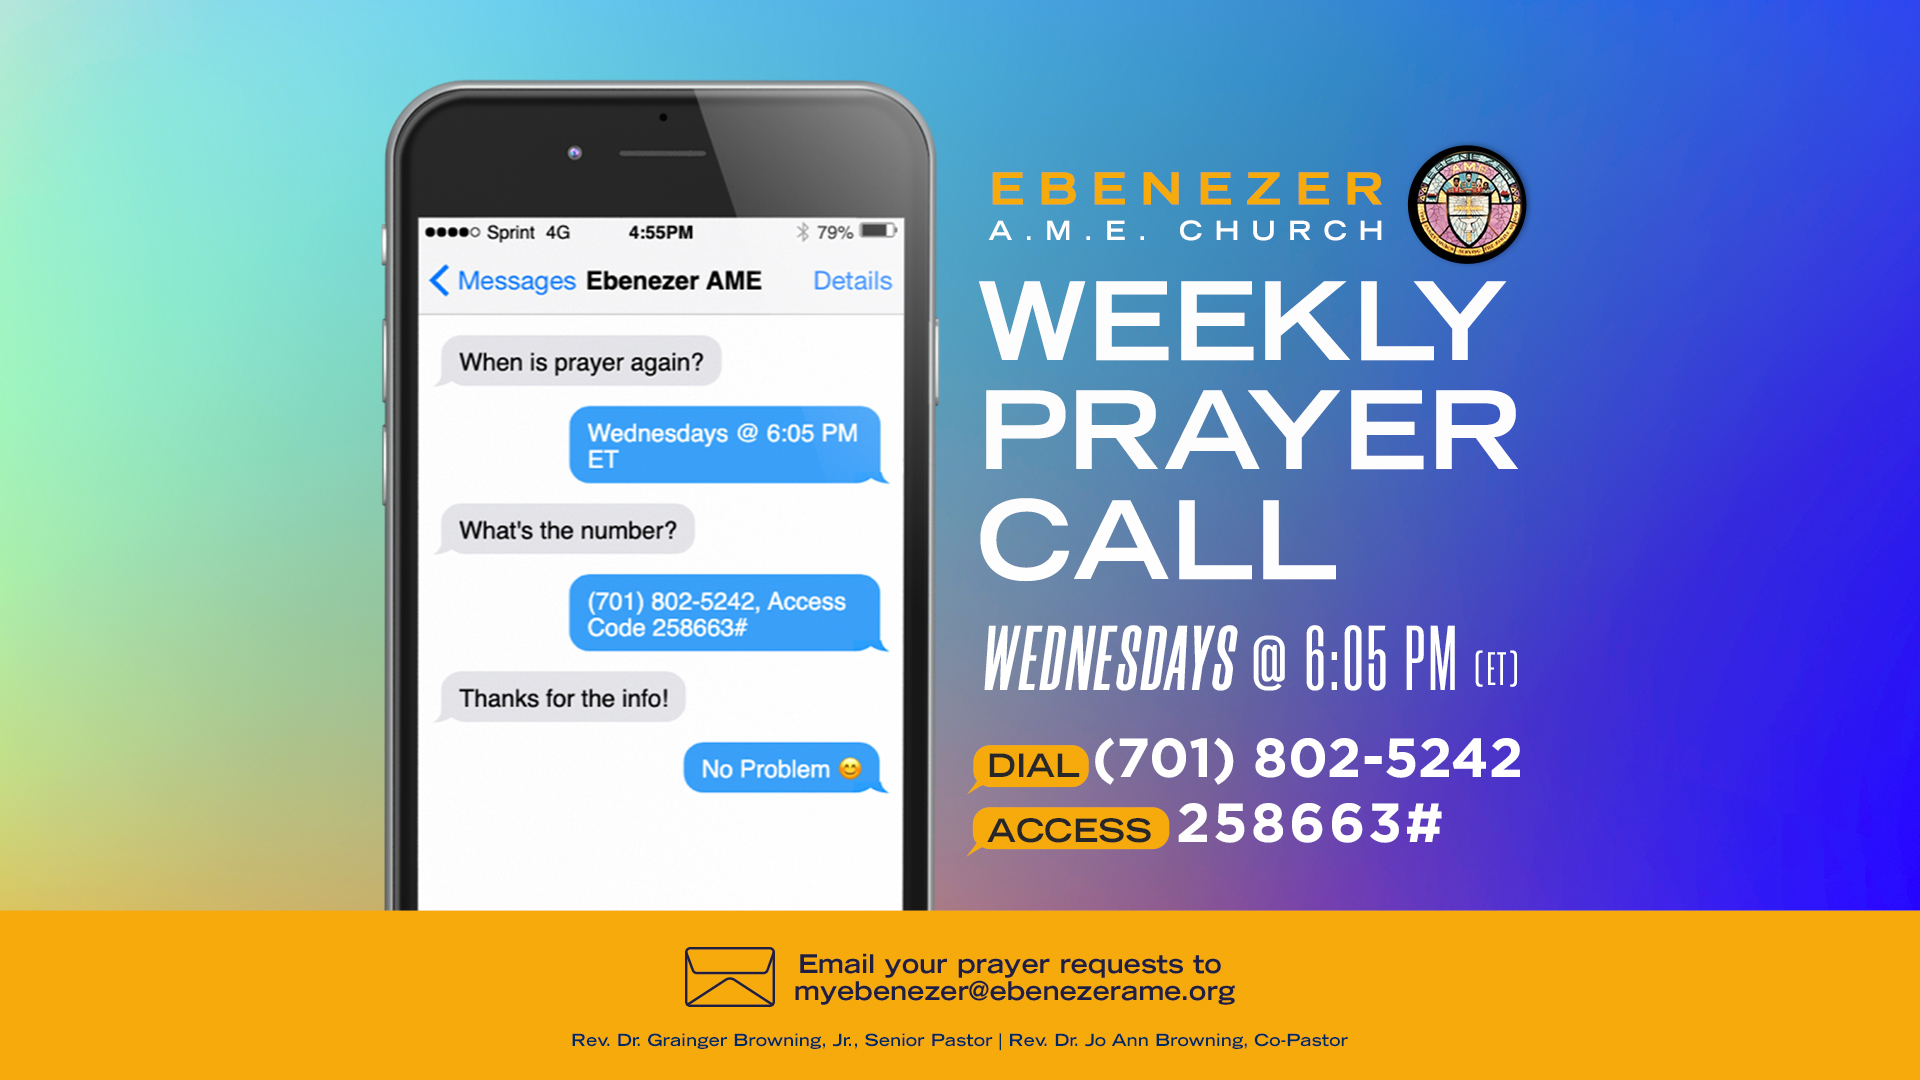 Weekly Churchwide Prayer Call